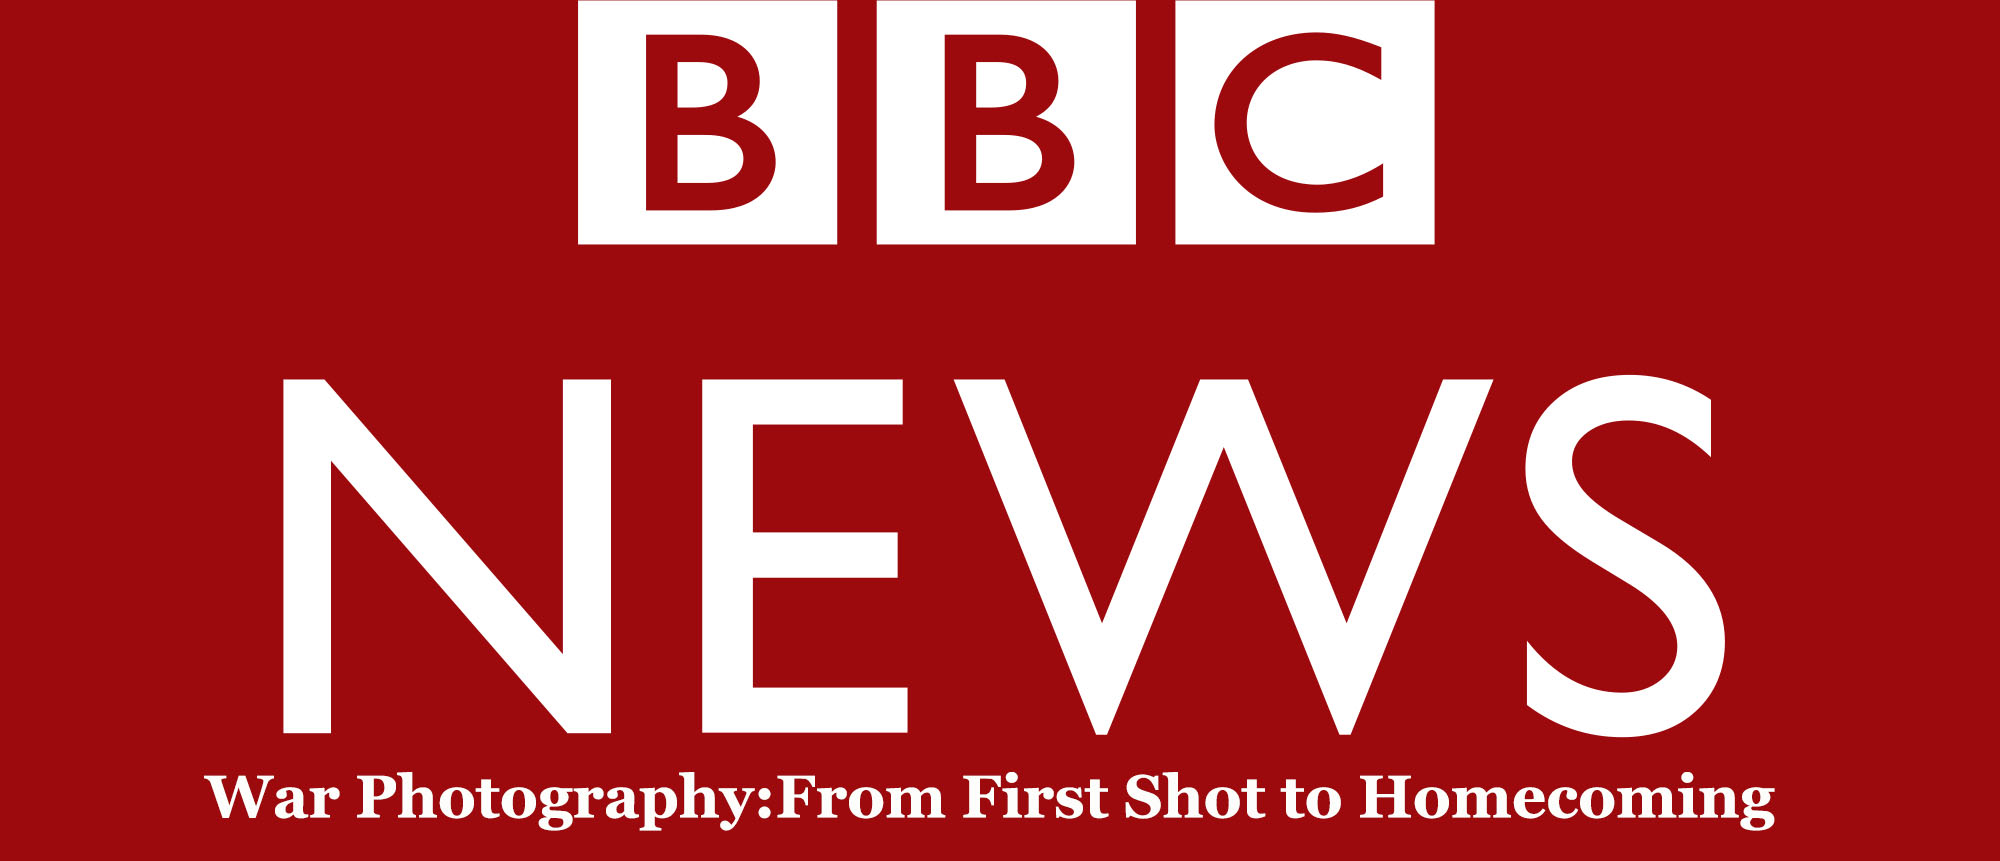 War photography, BBC, photojournalism